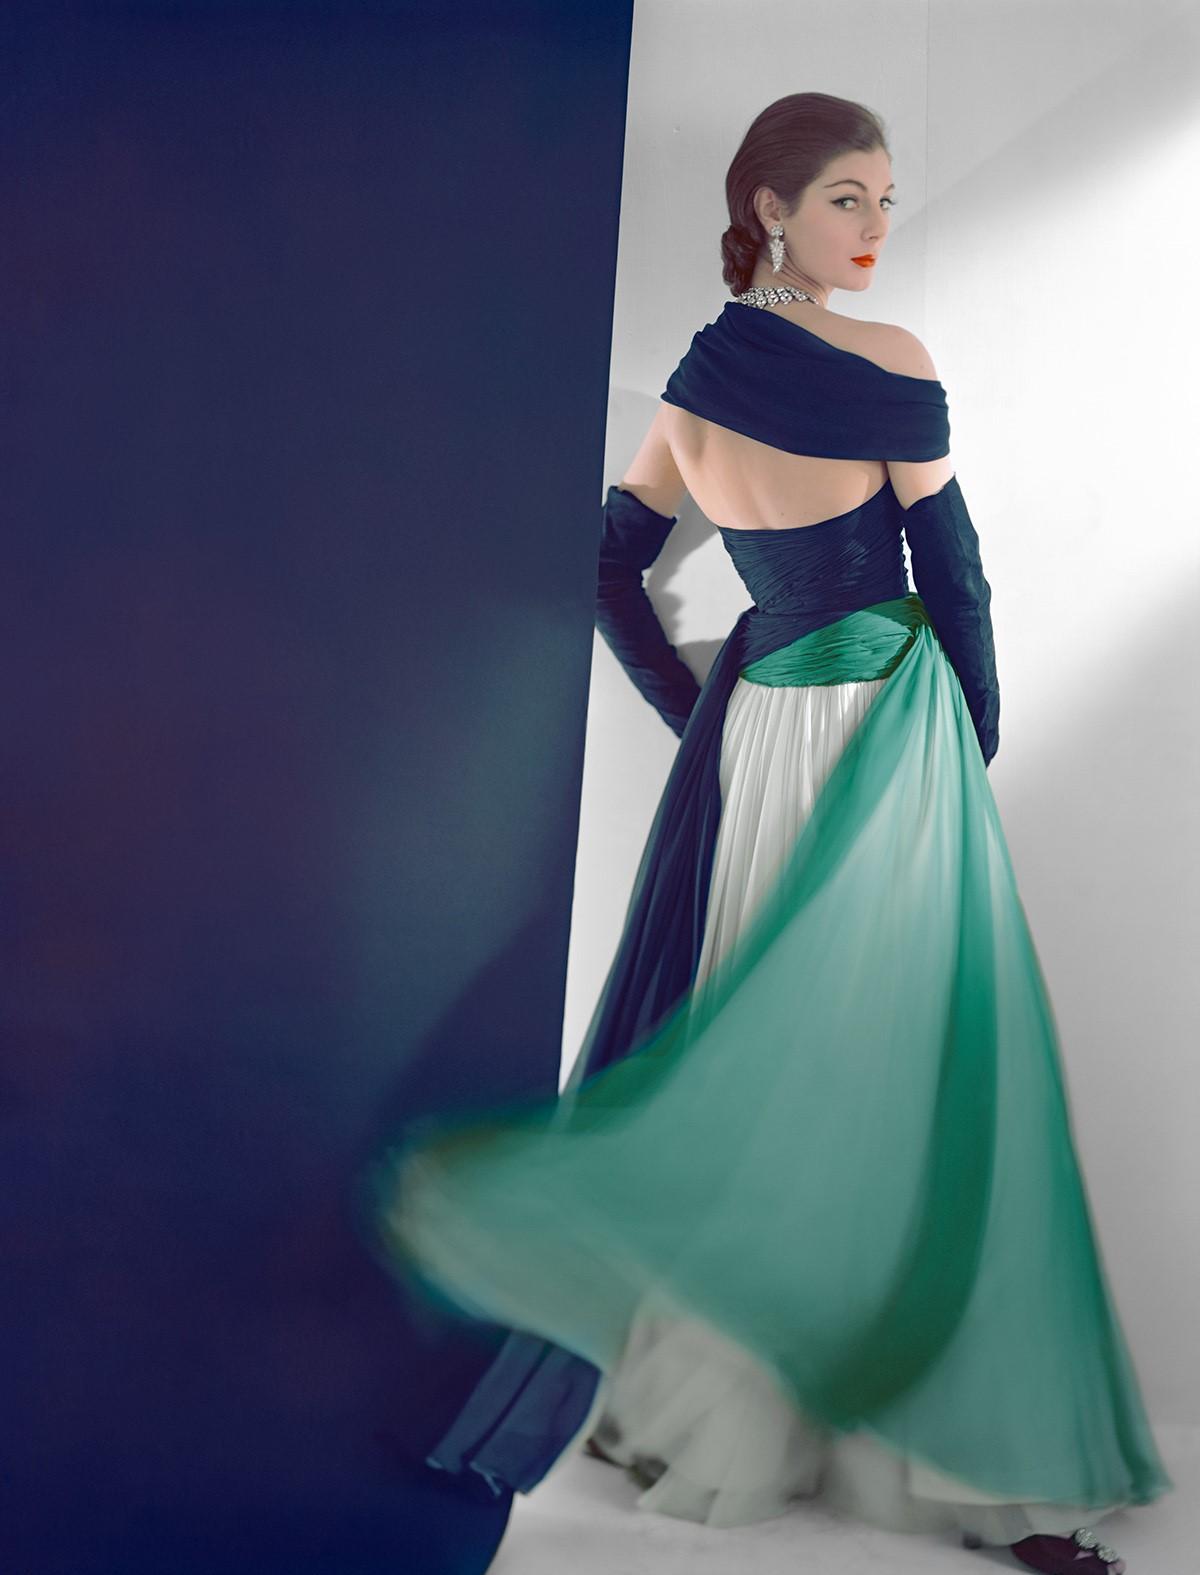 HORST P. HORST, Dress by Jean Desses , 1952